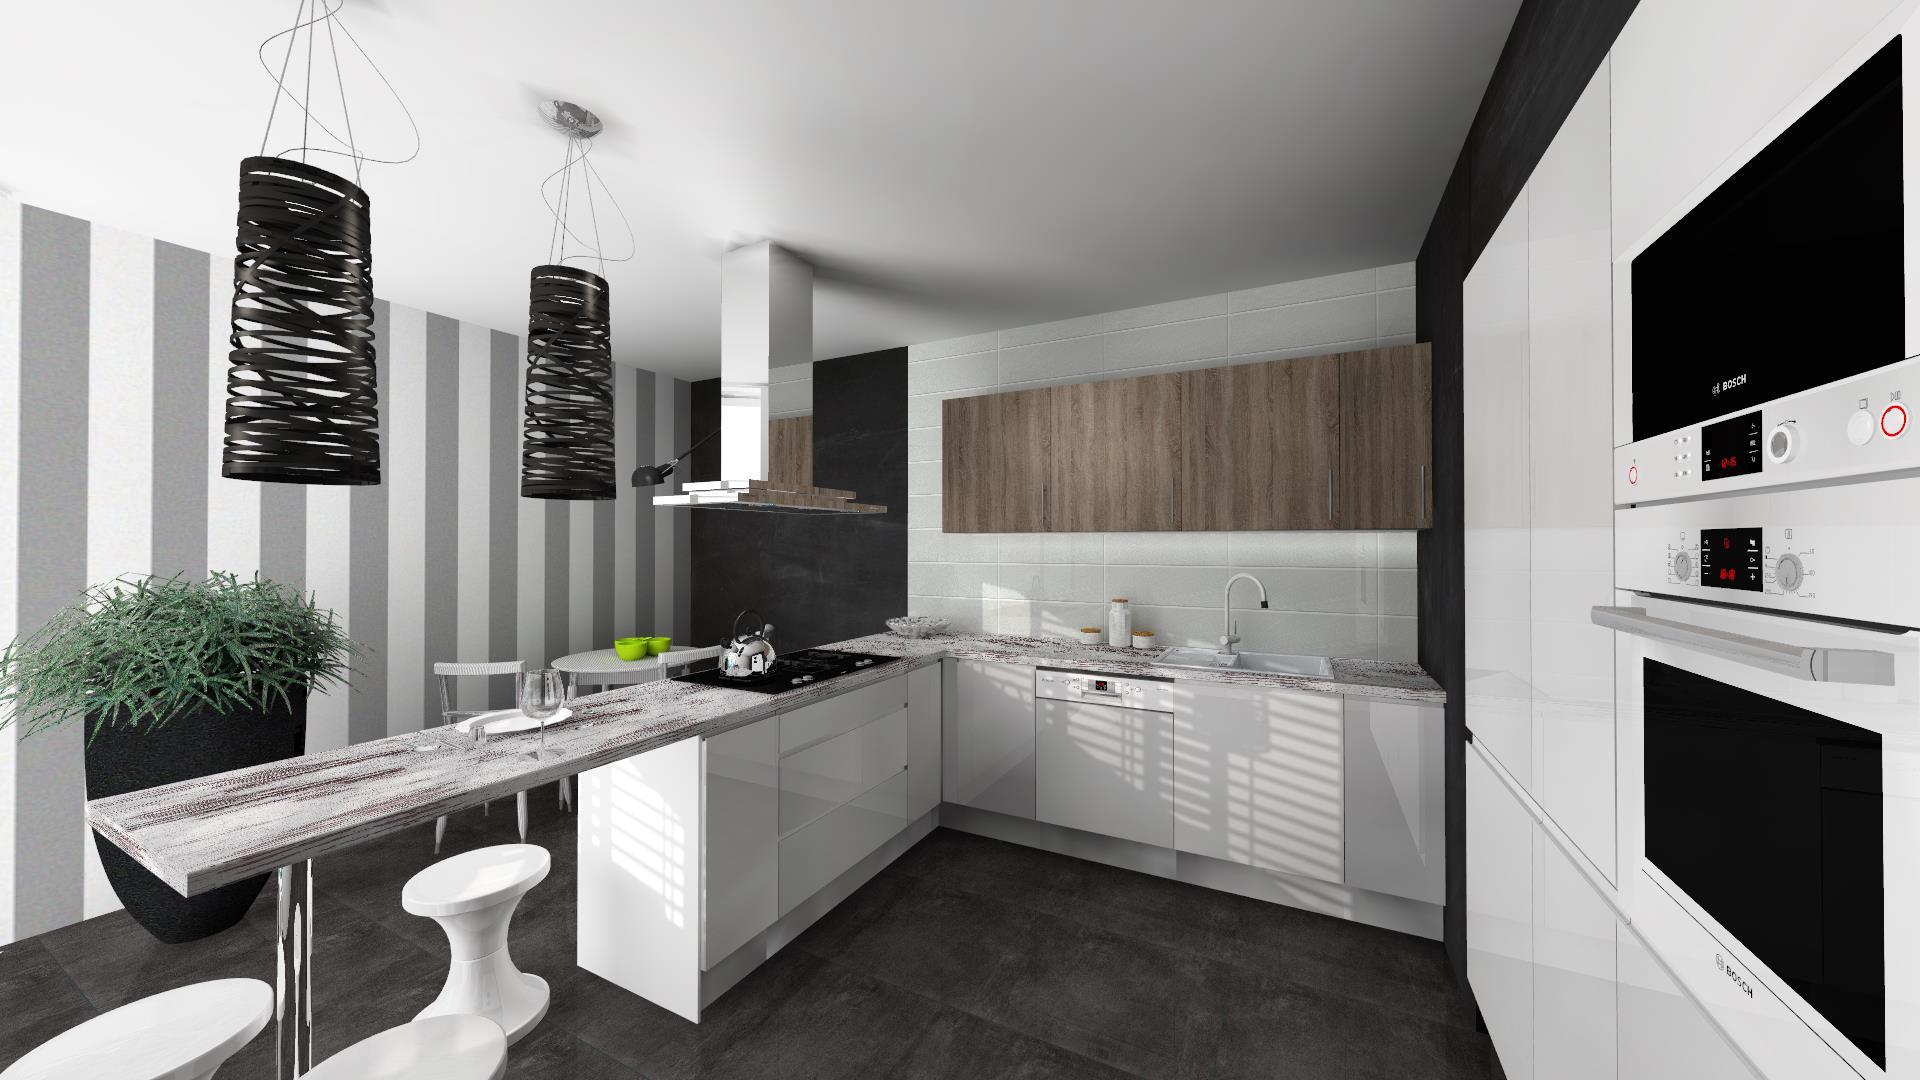 Funkcjonalna kuchnia, projektowanie kuchni, kuchnia, design, projekty Aranża   -> Funkcjonalna Kuchnia Zdjecia